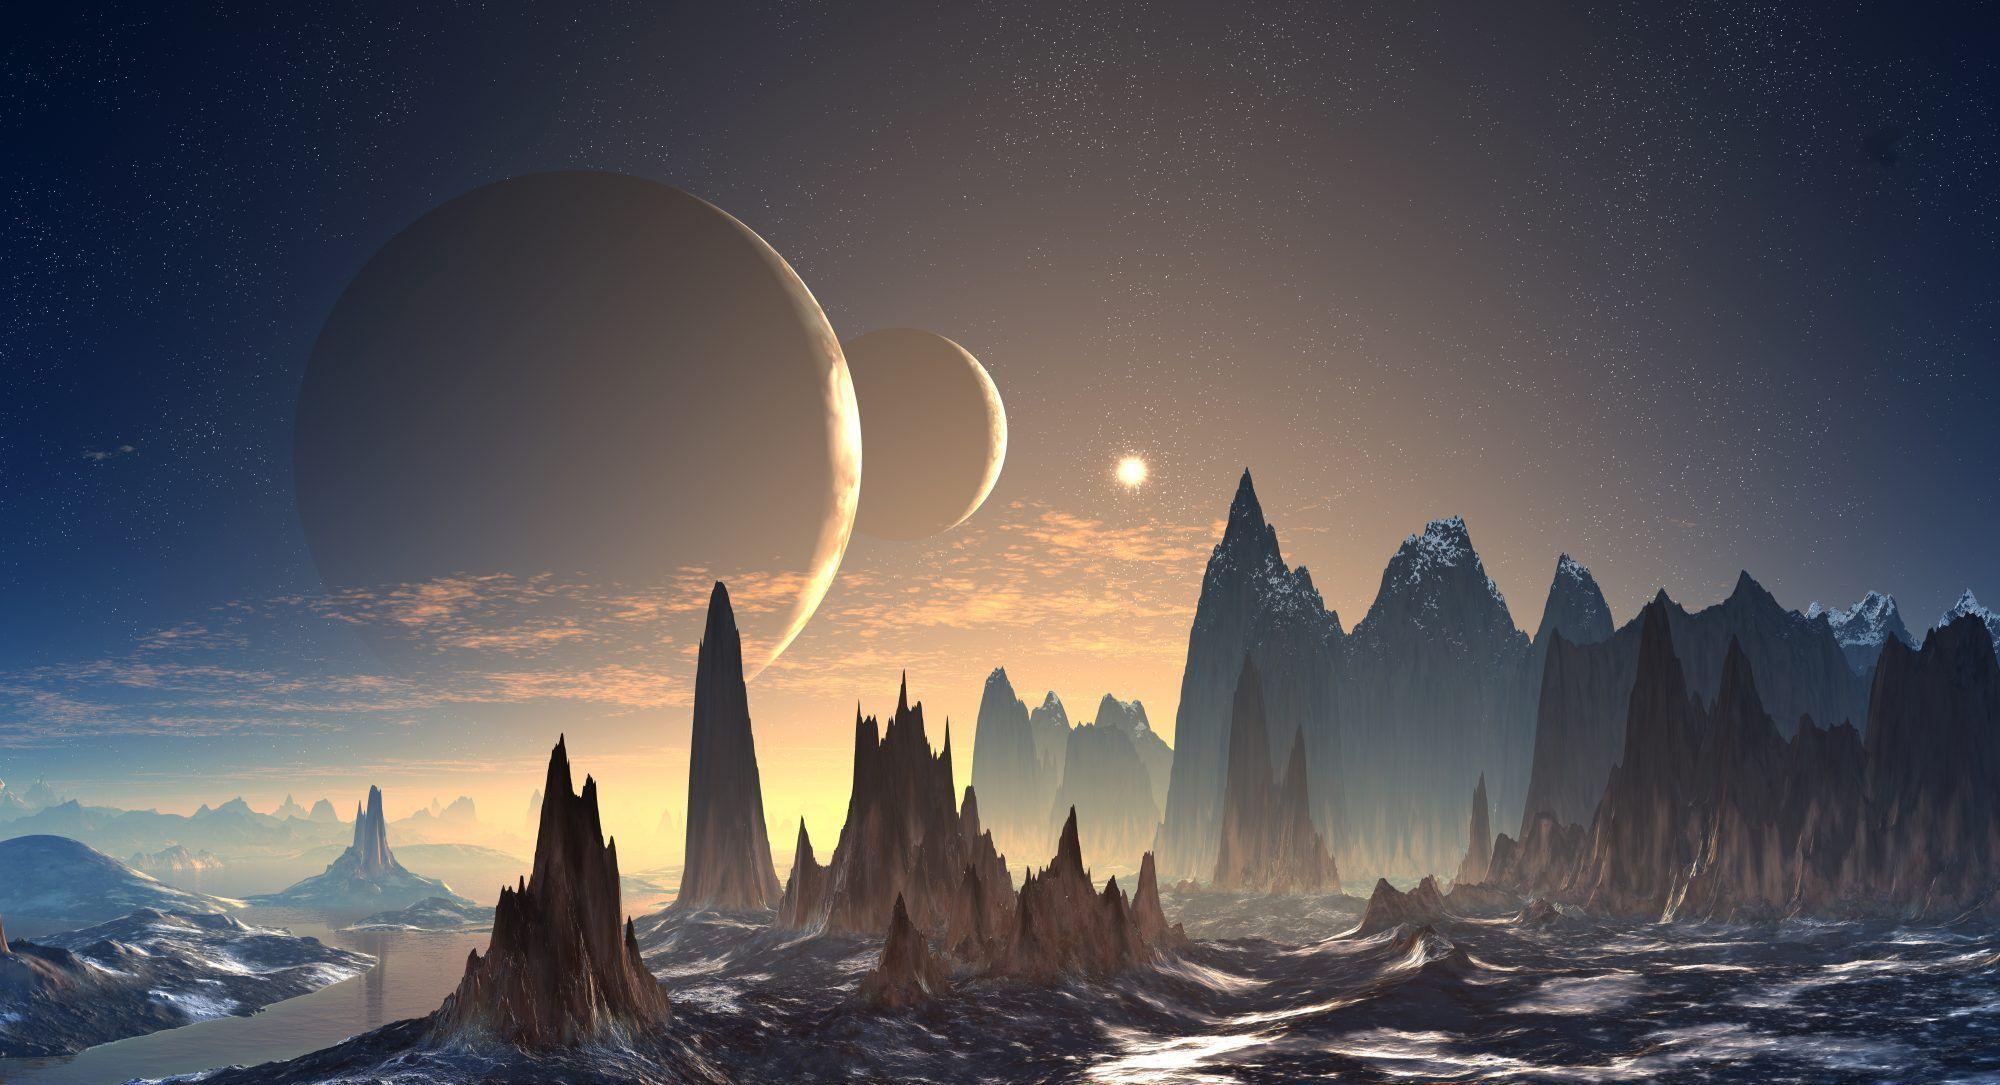 Urania Orion